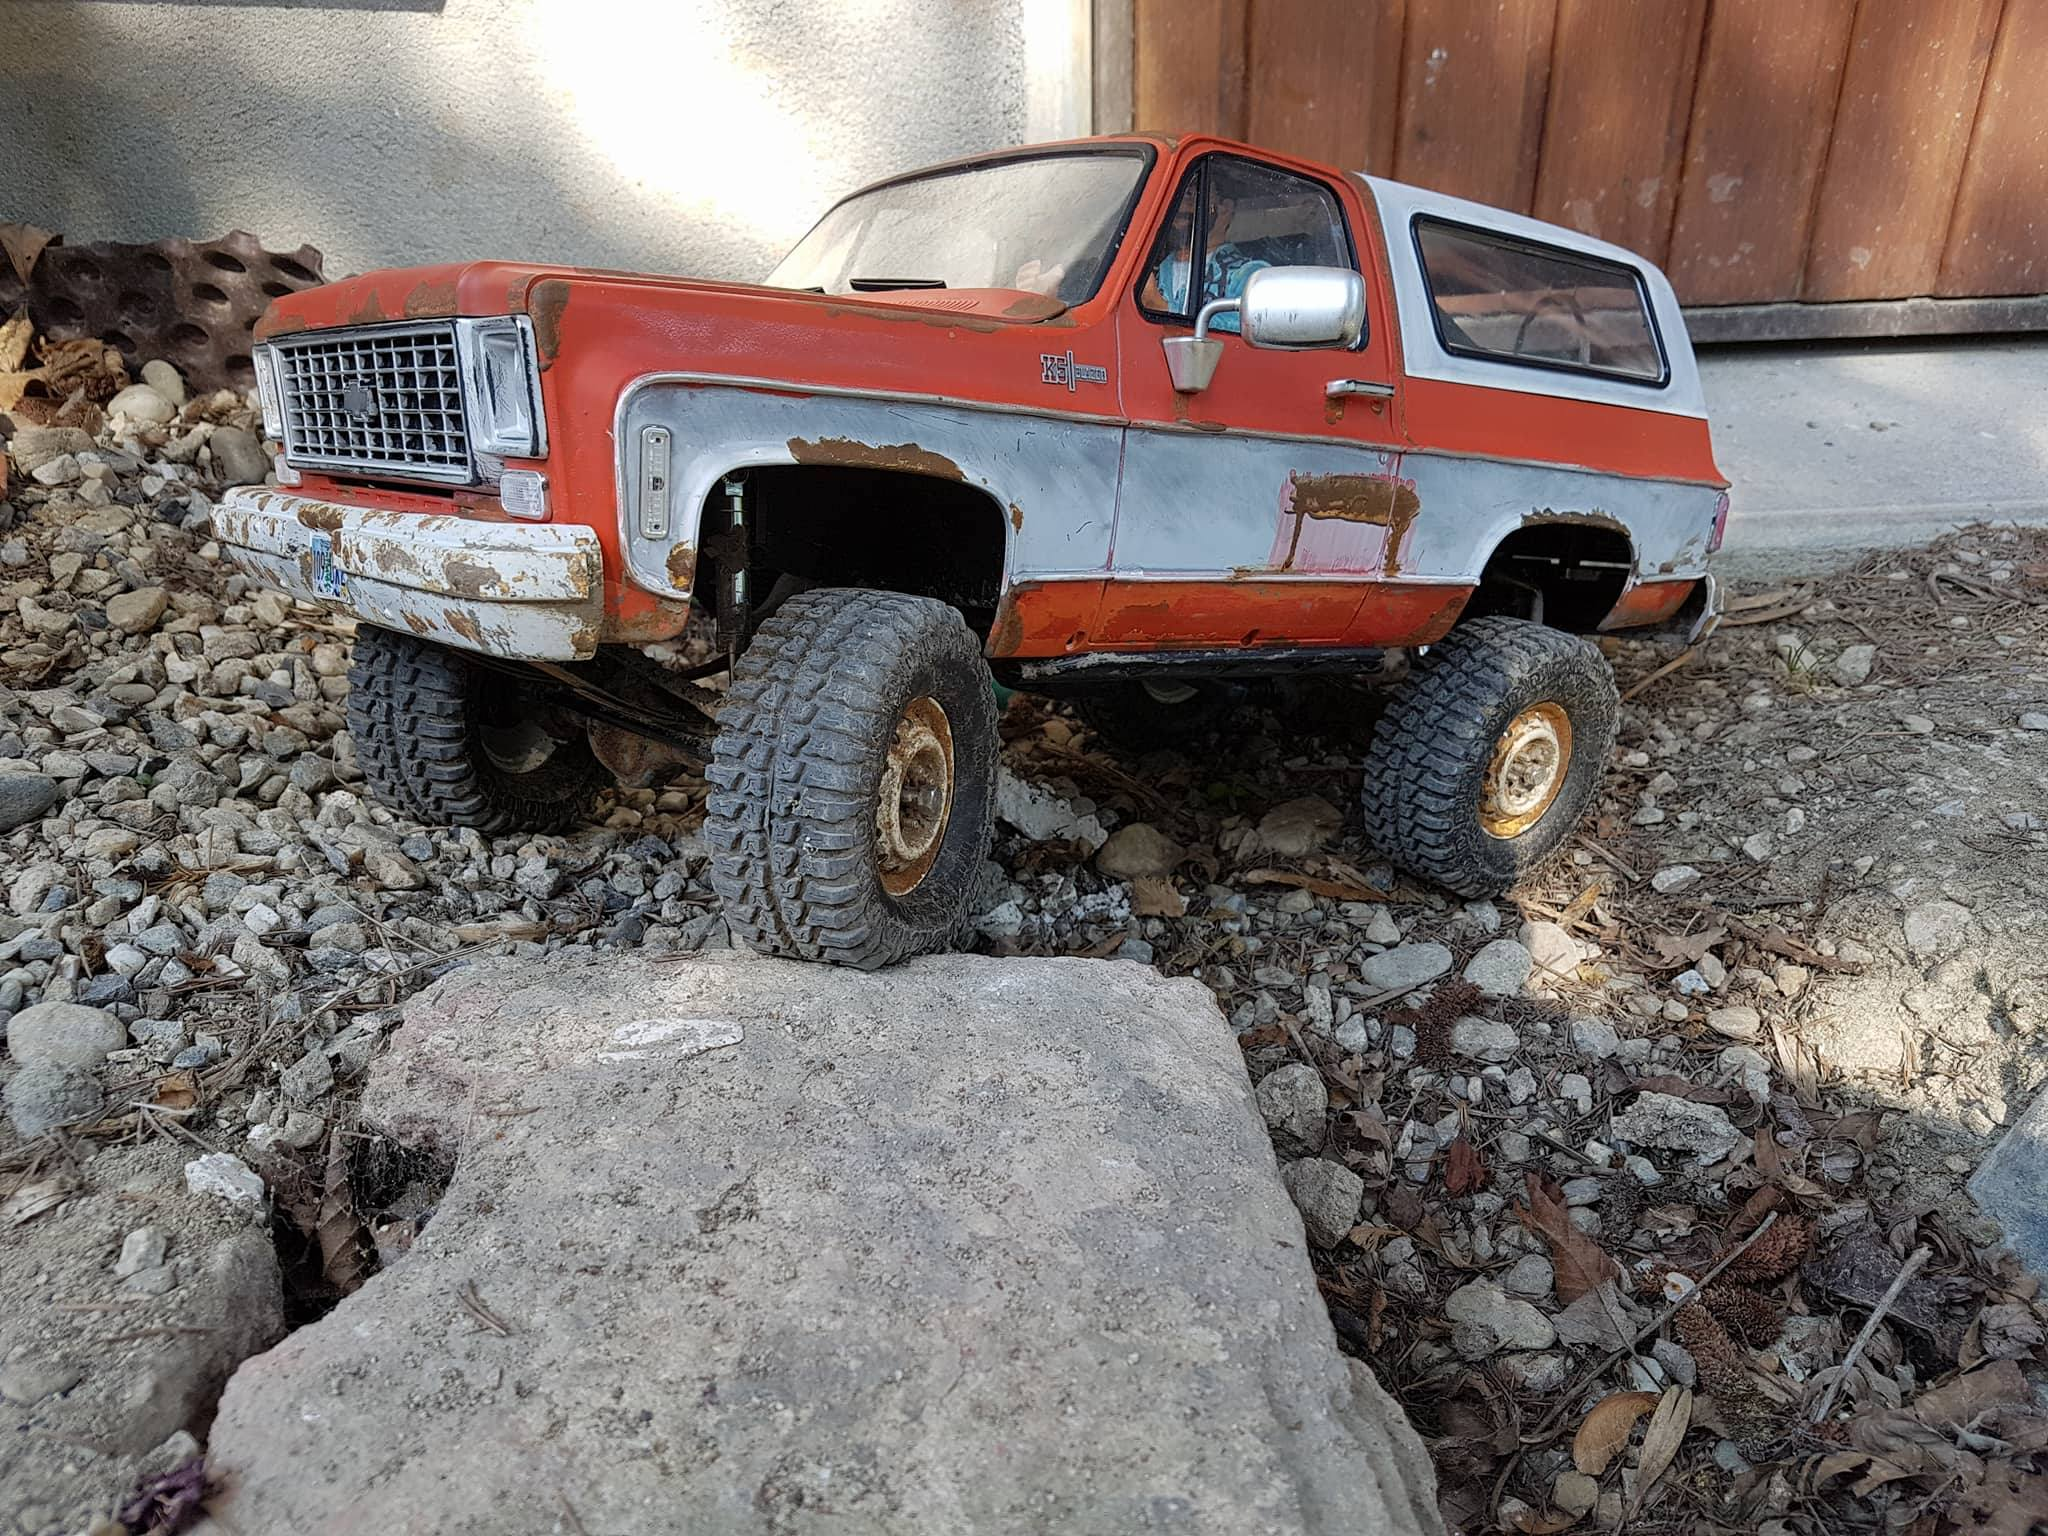 Farm Truck Chevrolet Blazer K5 sur TF2, Road Trip ! - Page 2 1496170552-18817768-1284018211716719-1166417518-o